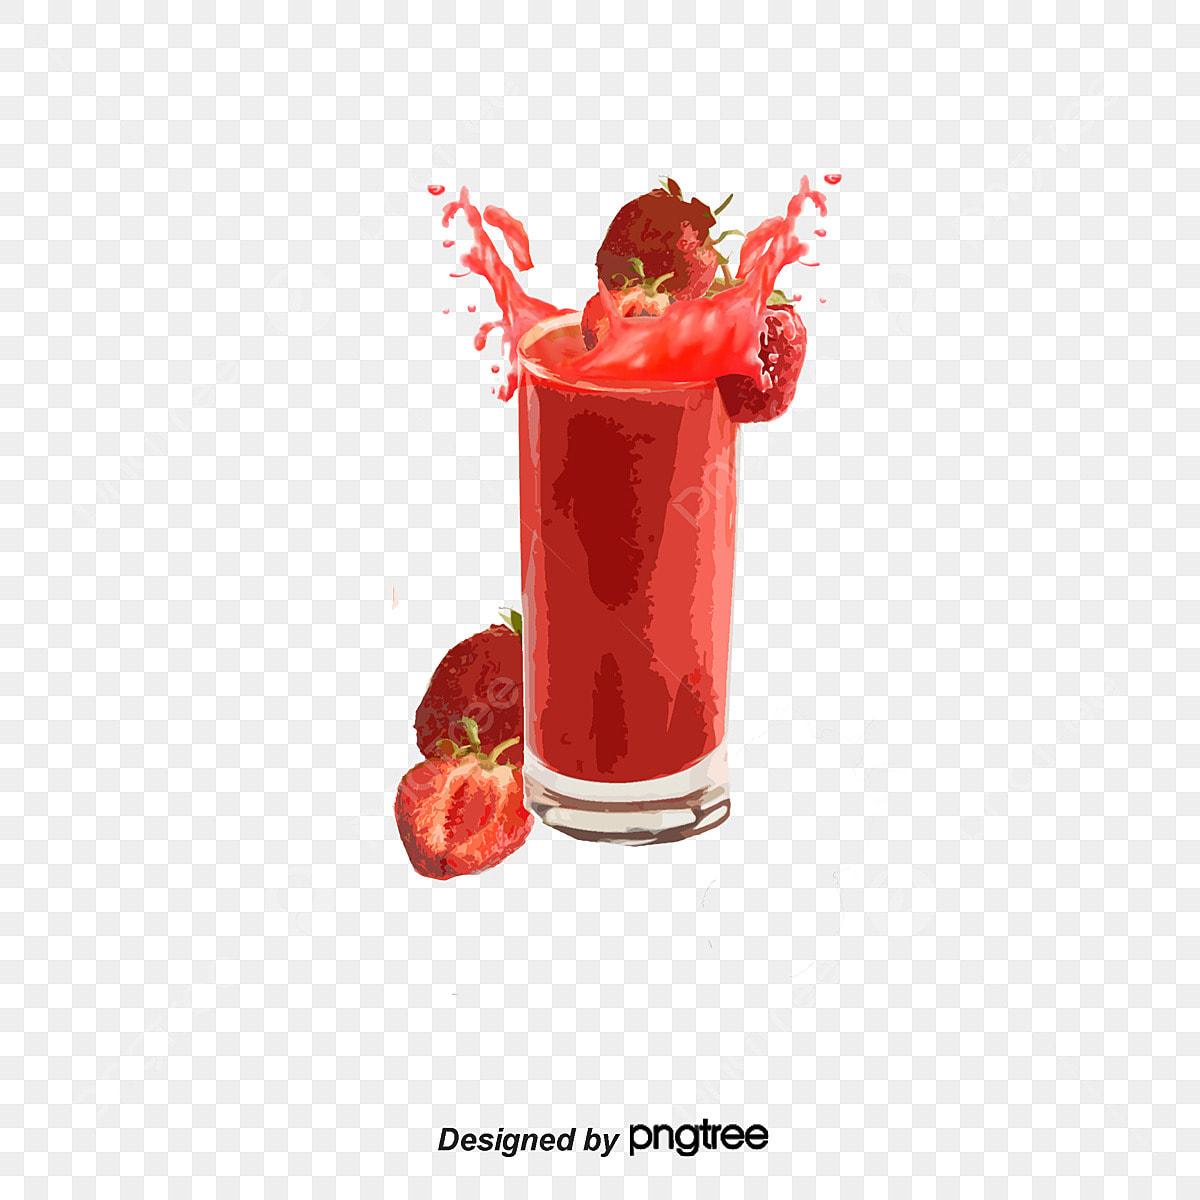 Ais Krim Corak Makanan Vektor Ilustrasi Jus Strawberi Ais